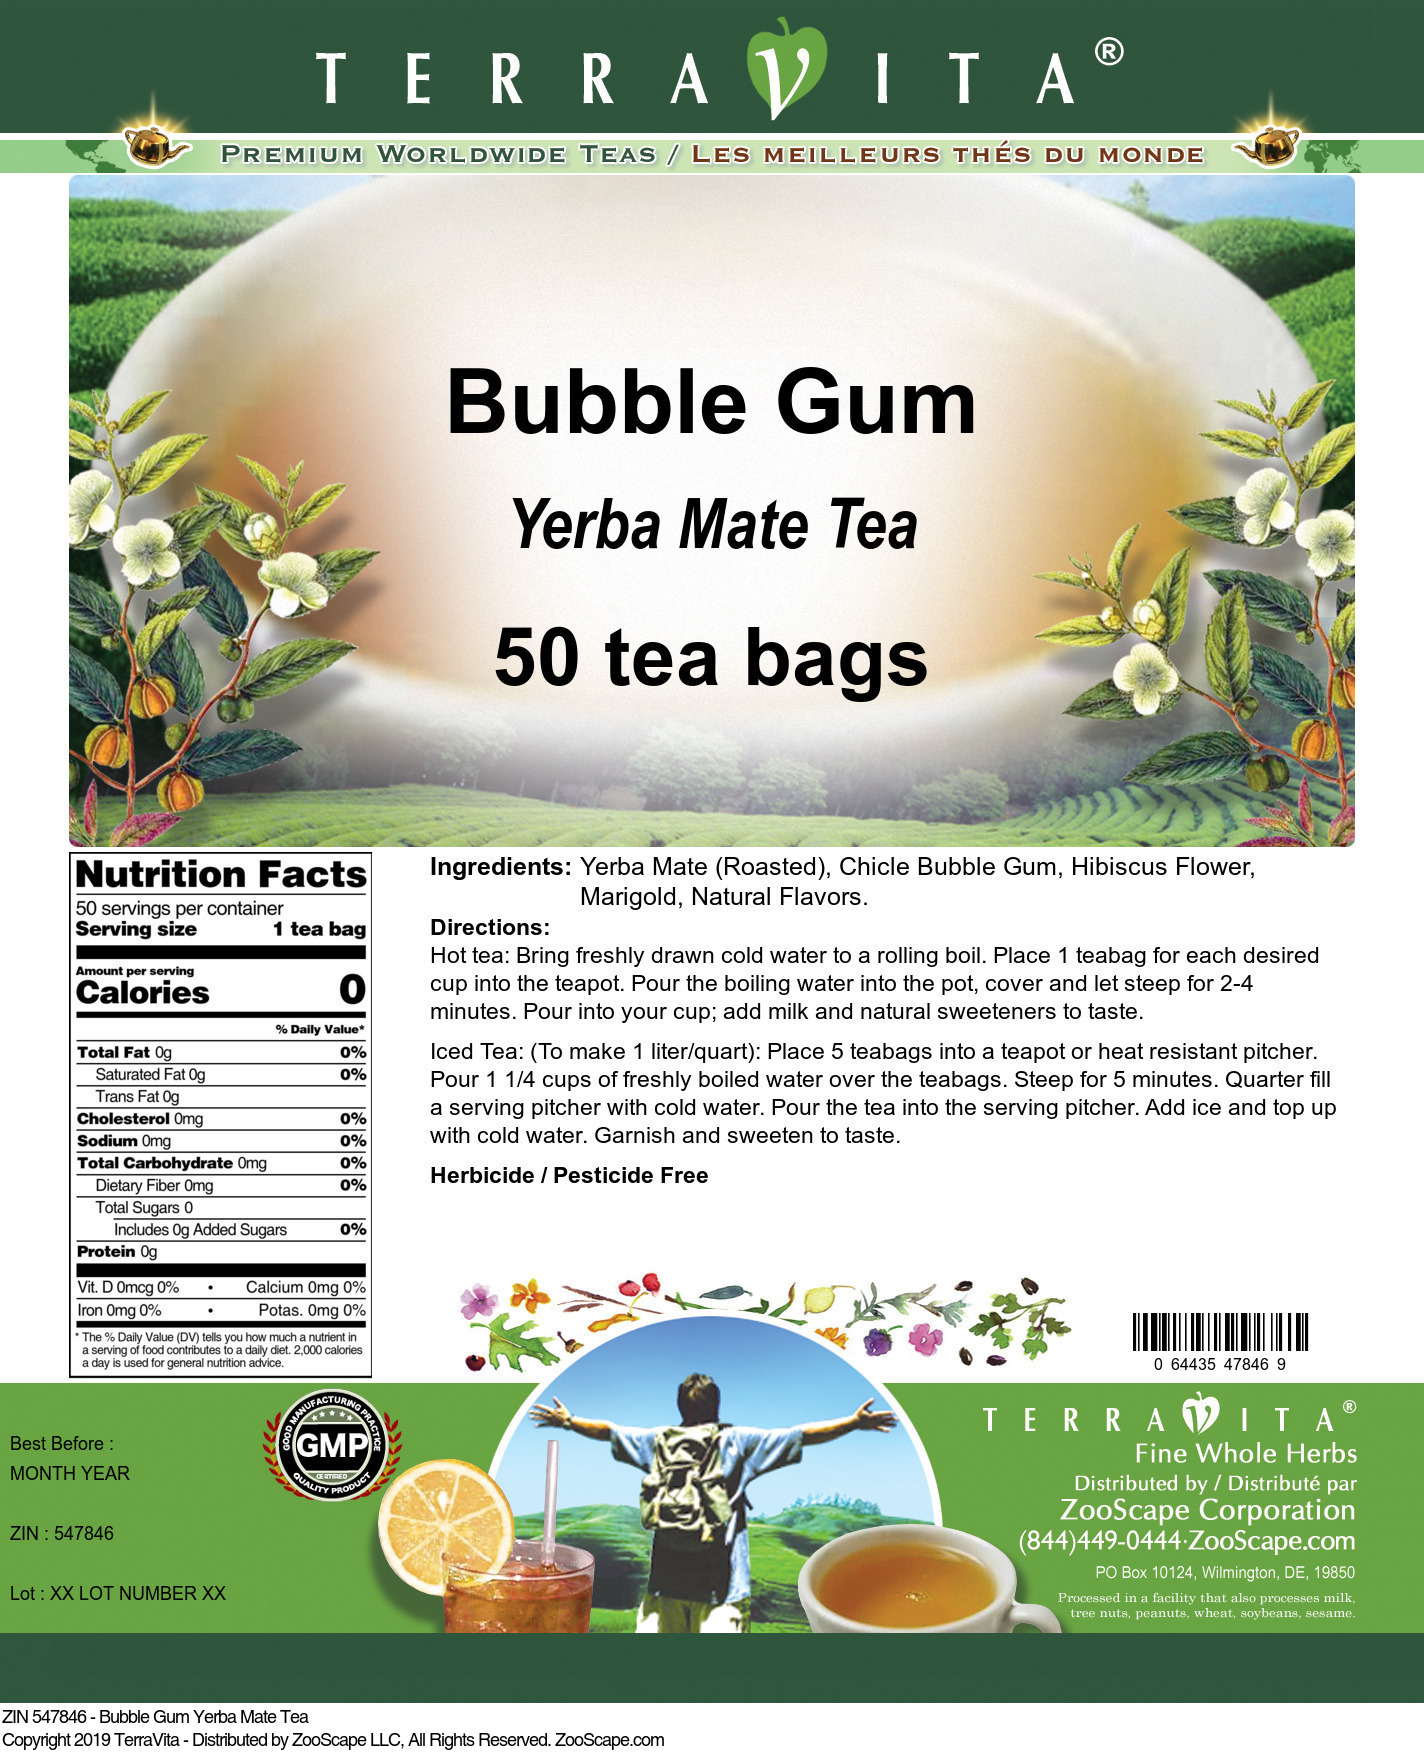 Bubble Gum Yerba Mate Tea